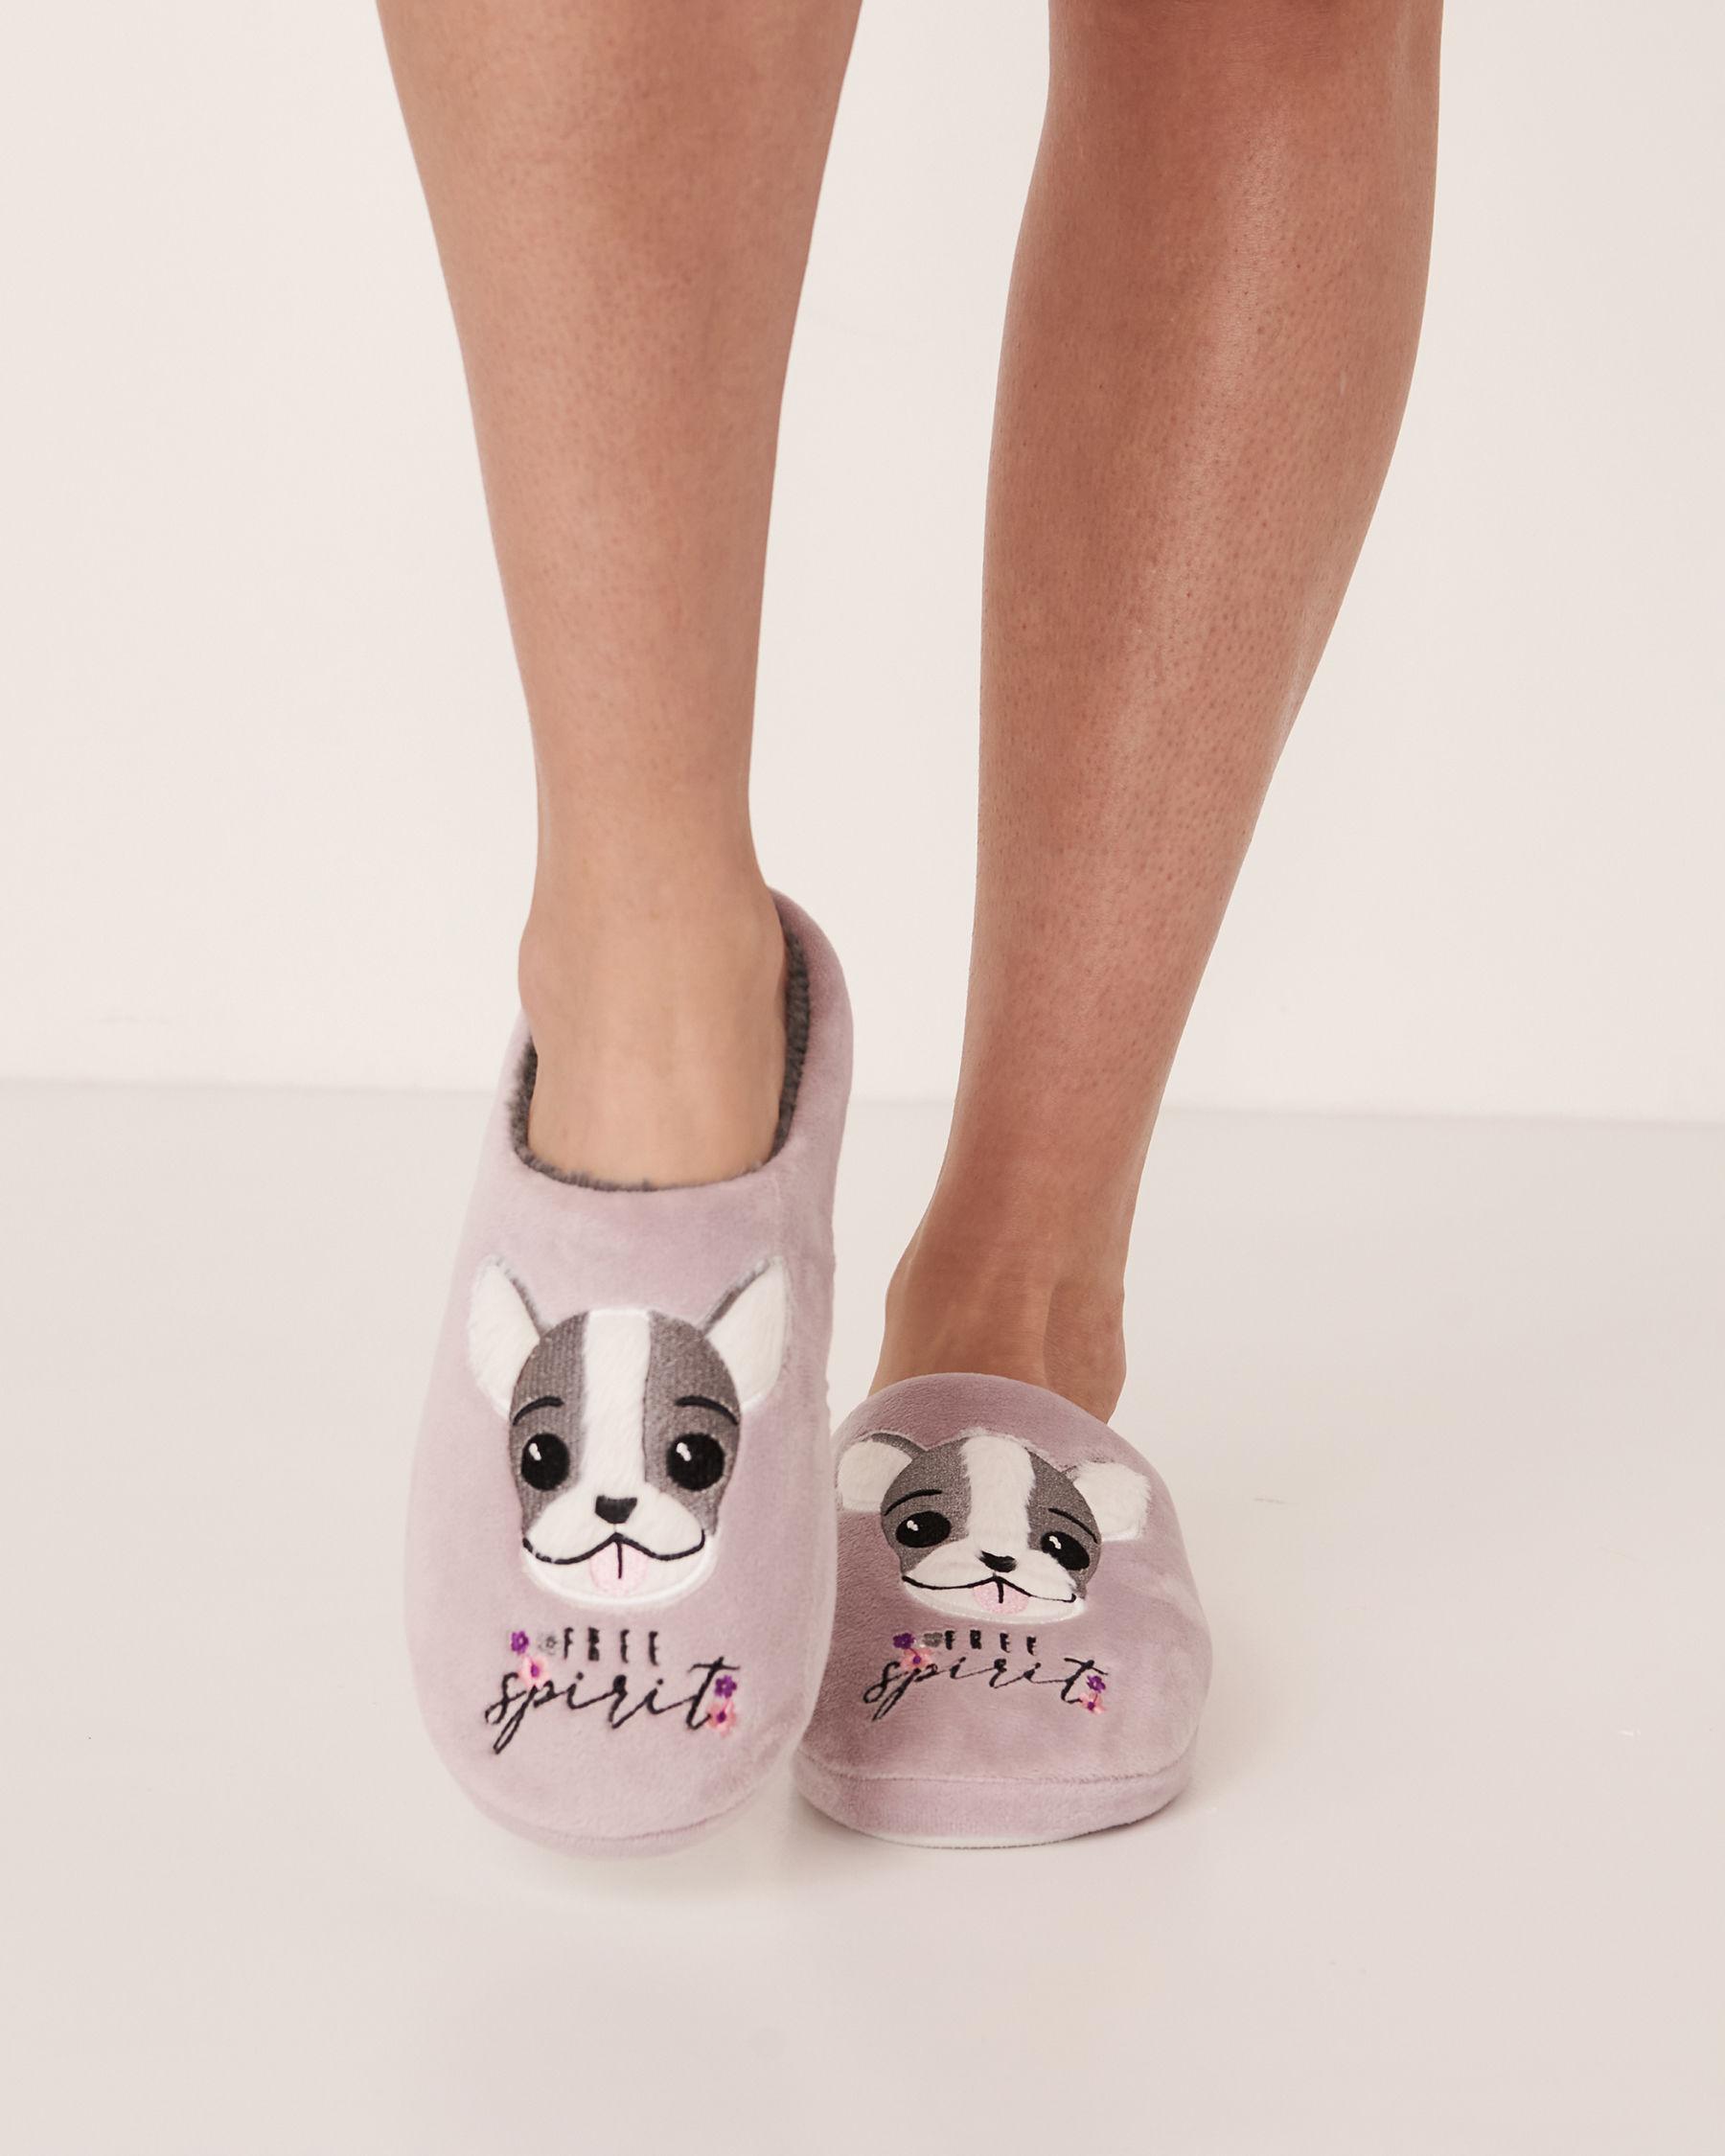 LA VIE EN ROSE Clog Slippers Lilac 40700018 - View1